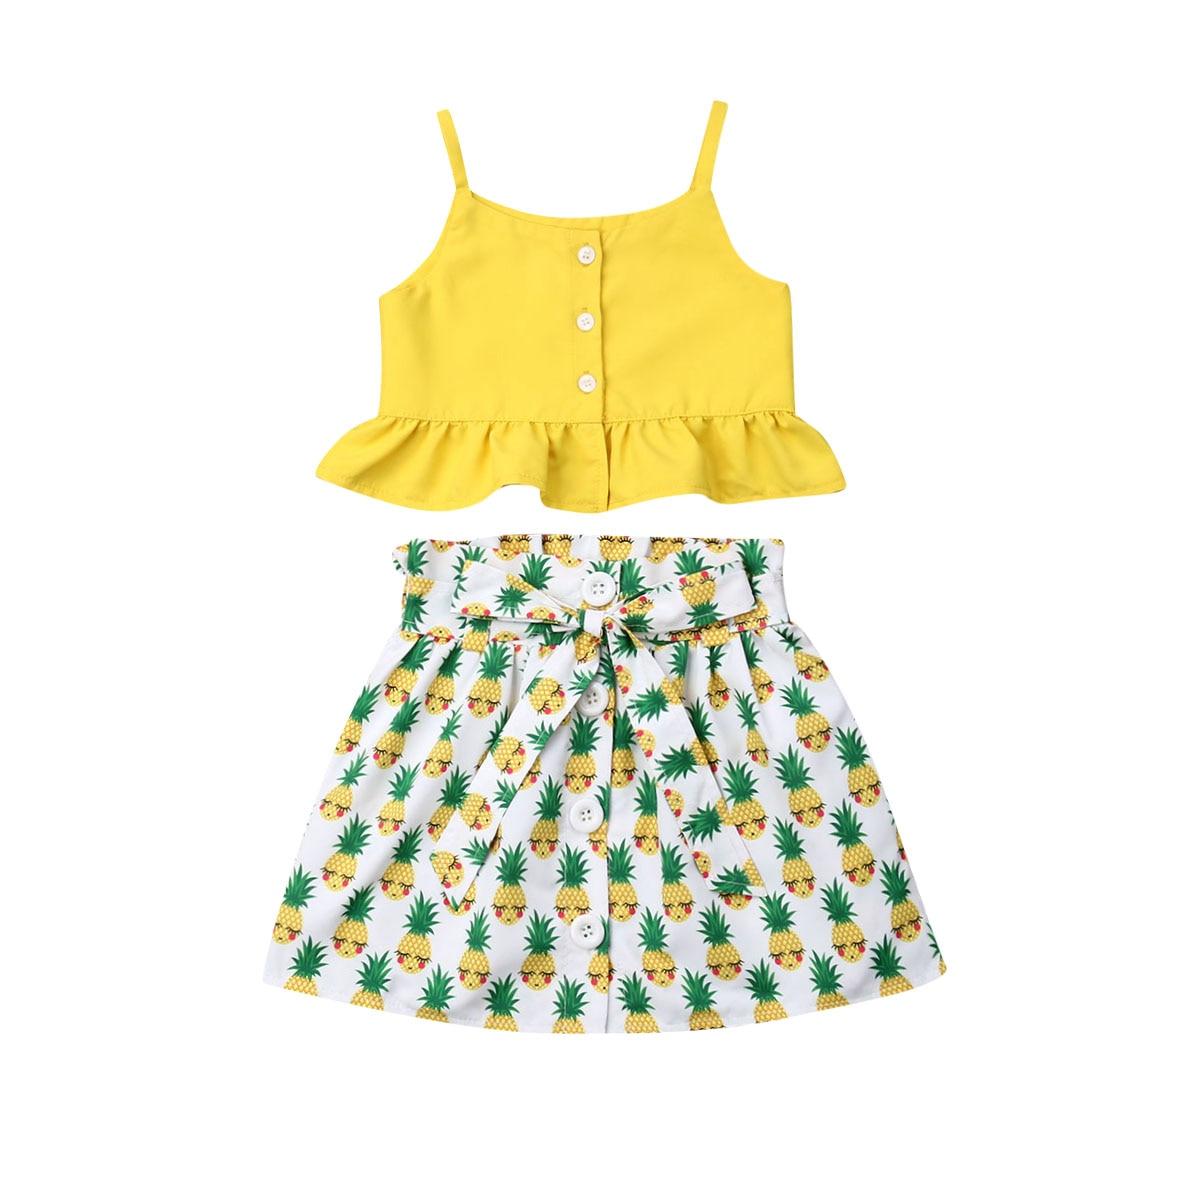 2pcs Summer Shorts Set Infant Kids Baby Girls Sleeveless Pineapple Romper Tops+Polka Dots Short Pants Outfits